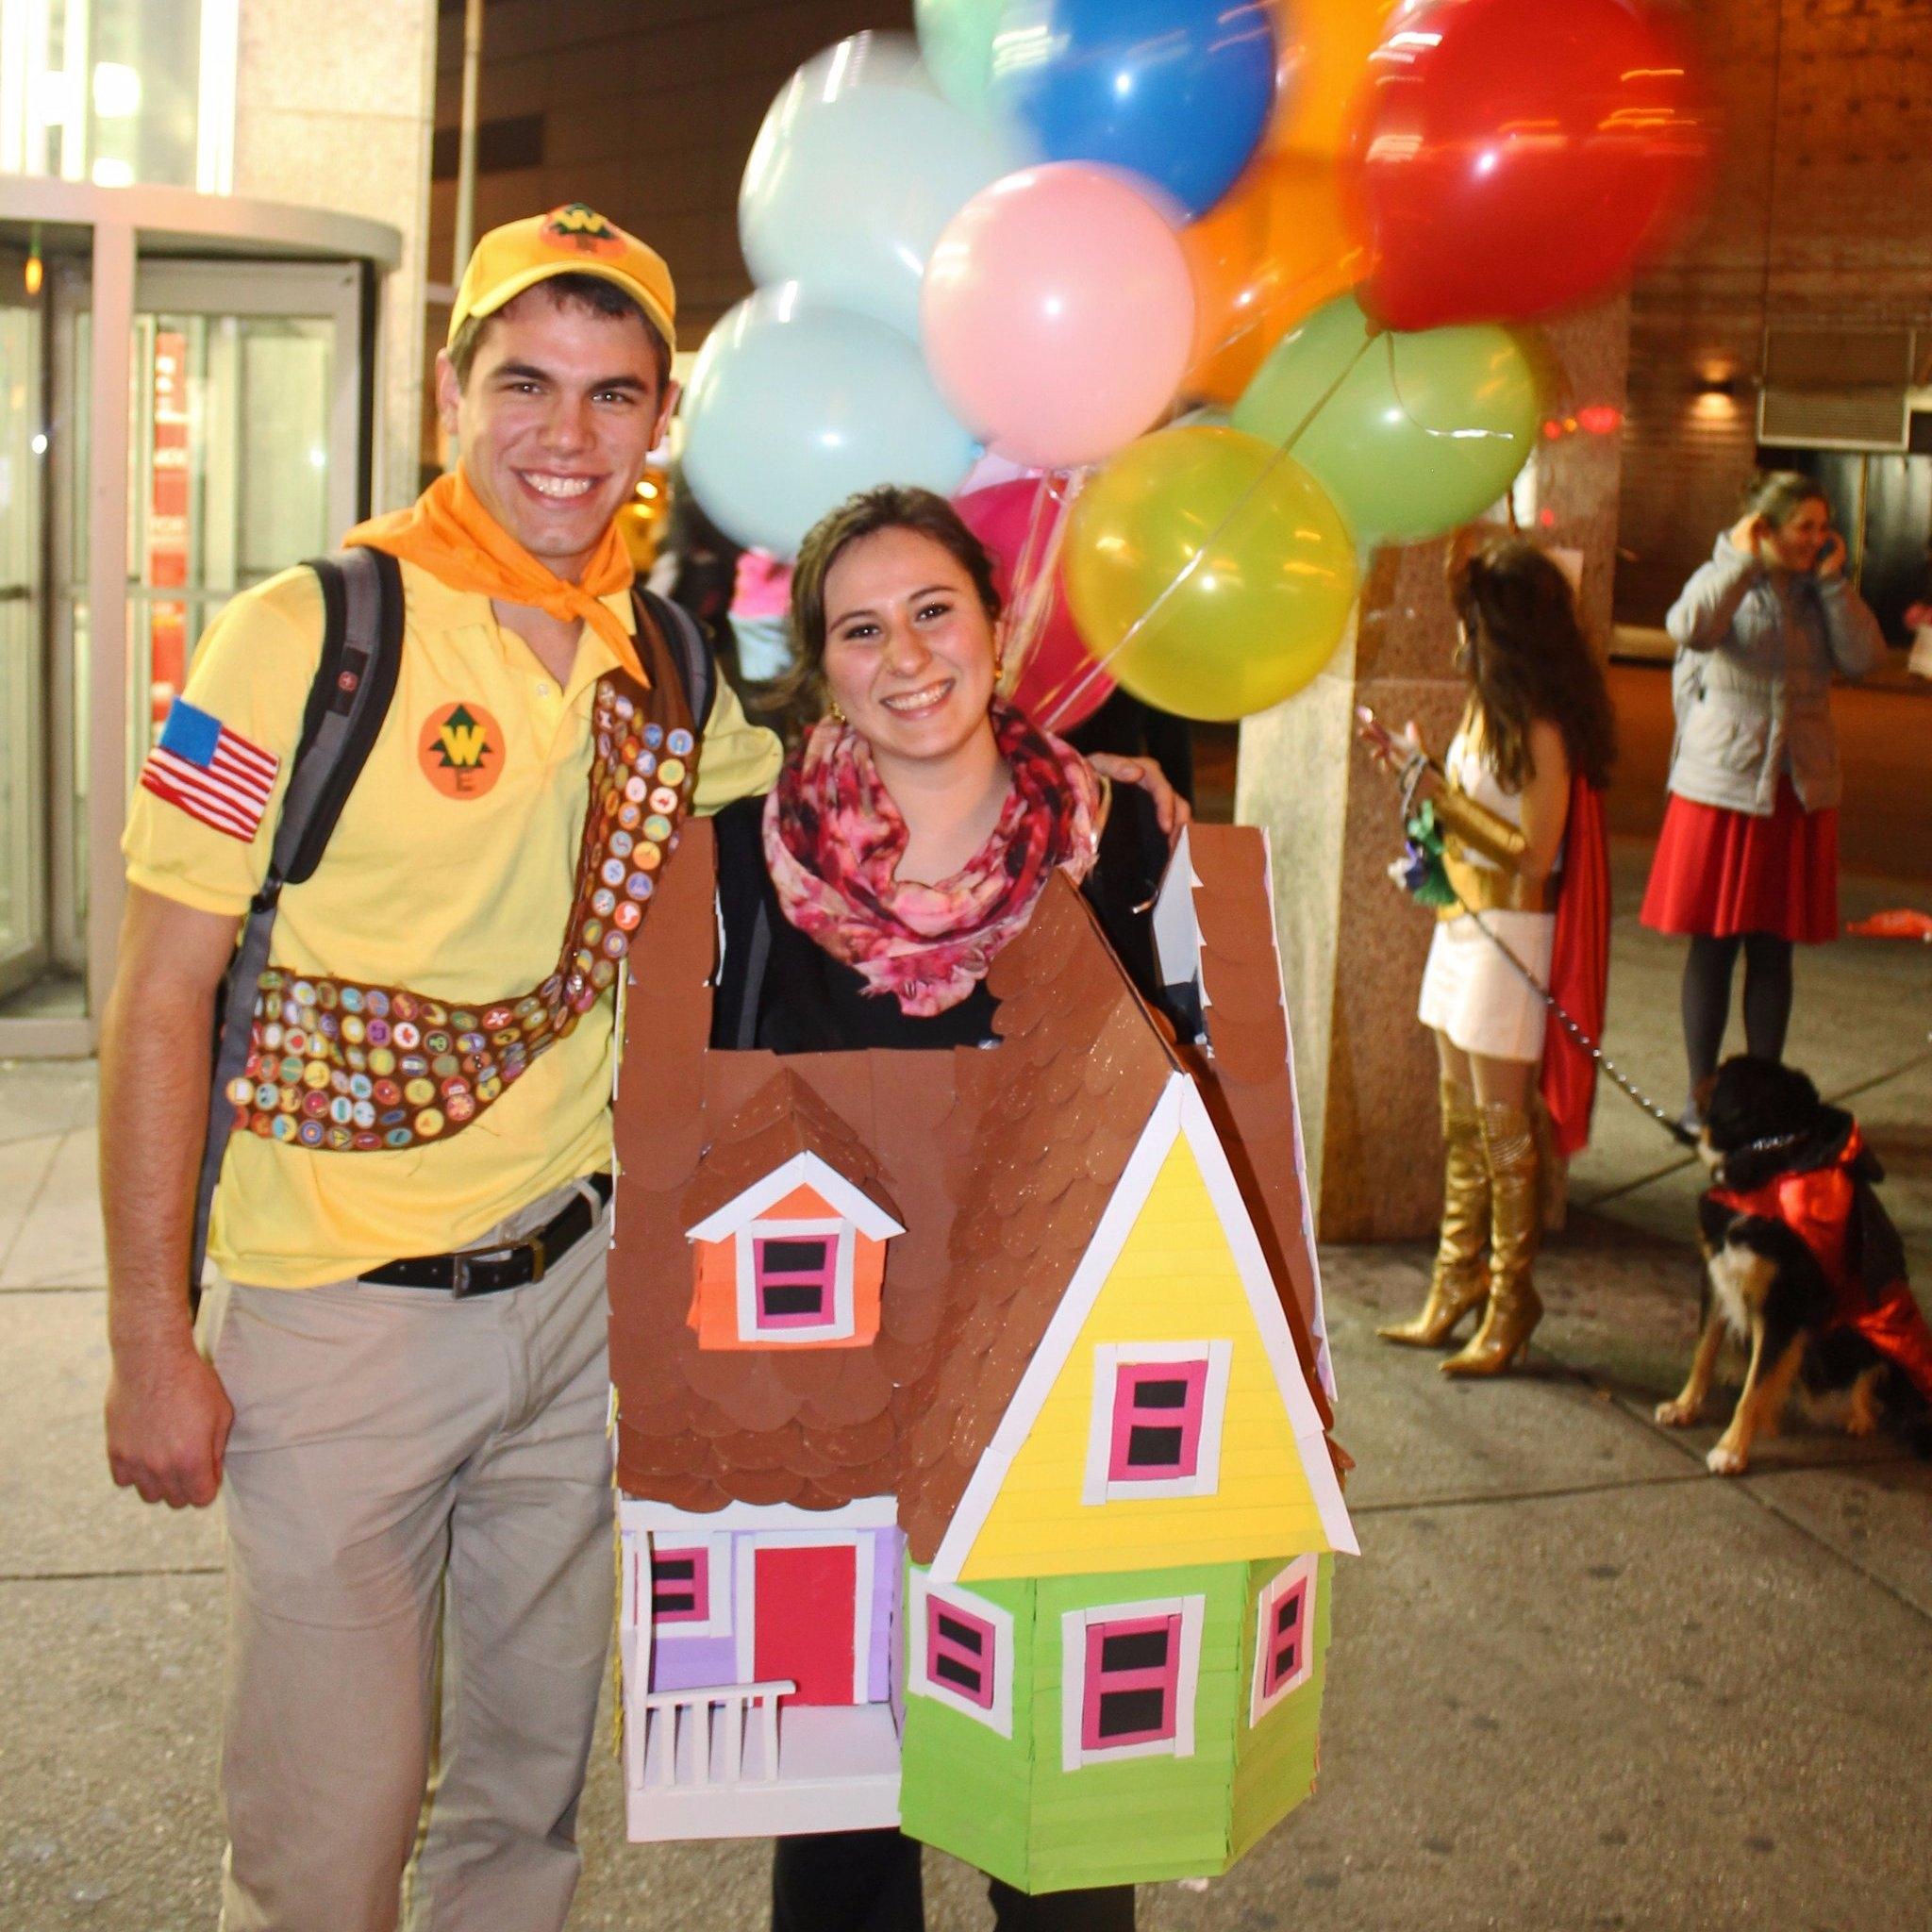 cheap diy couples halloween costumes | popsugar smart living